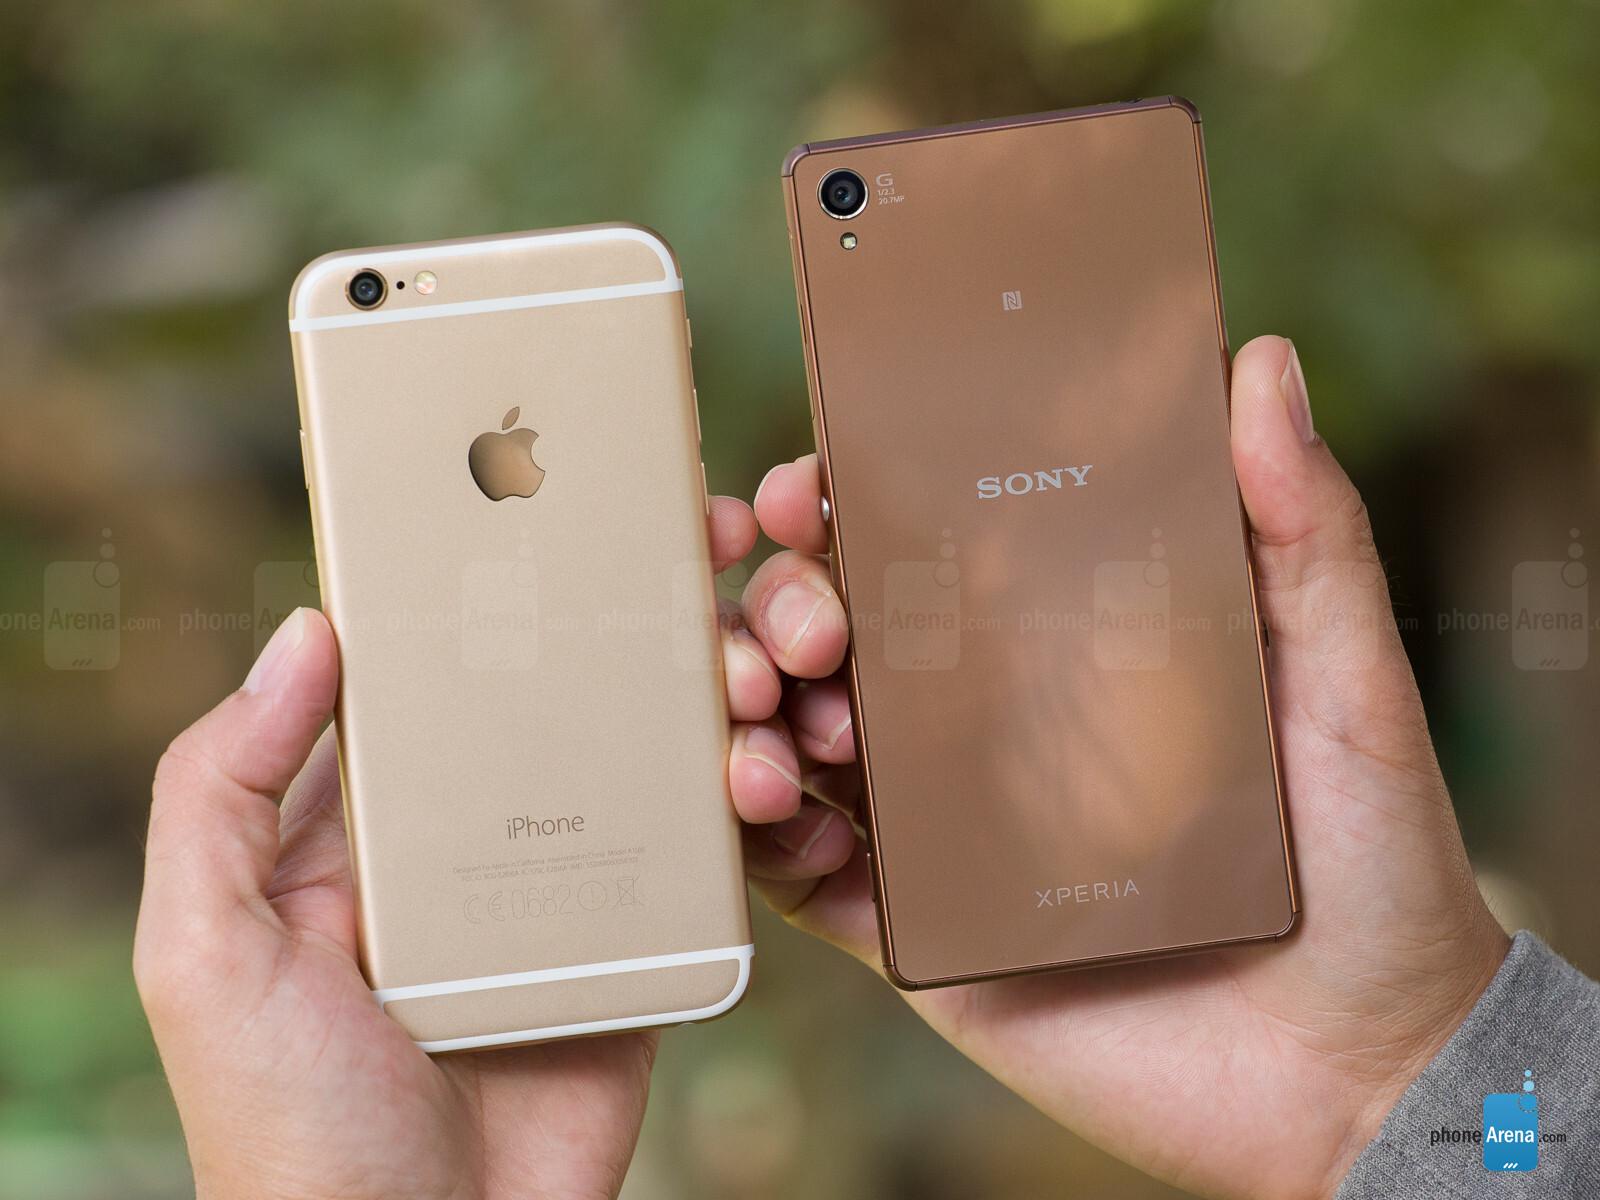 S8+ vs iphone 7 Plus vs xperia z3